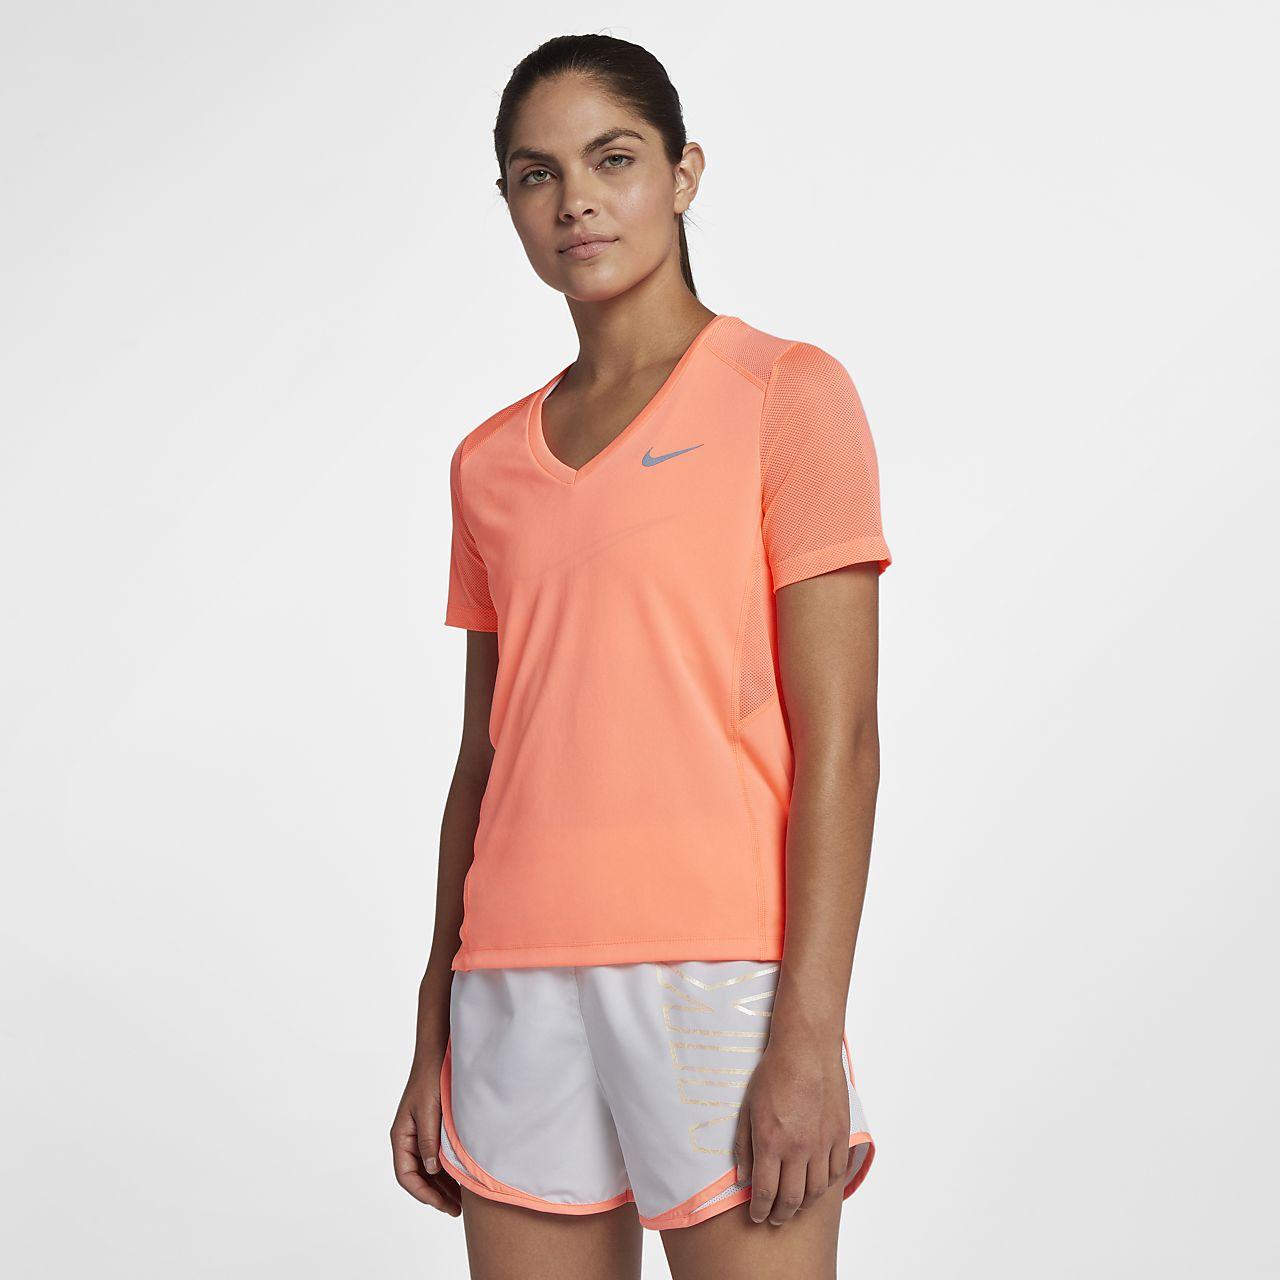 ... Nike Miler Women's Short-Sleeve Running Top